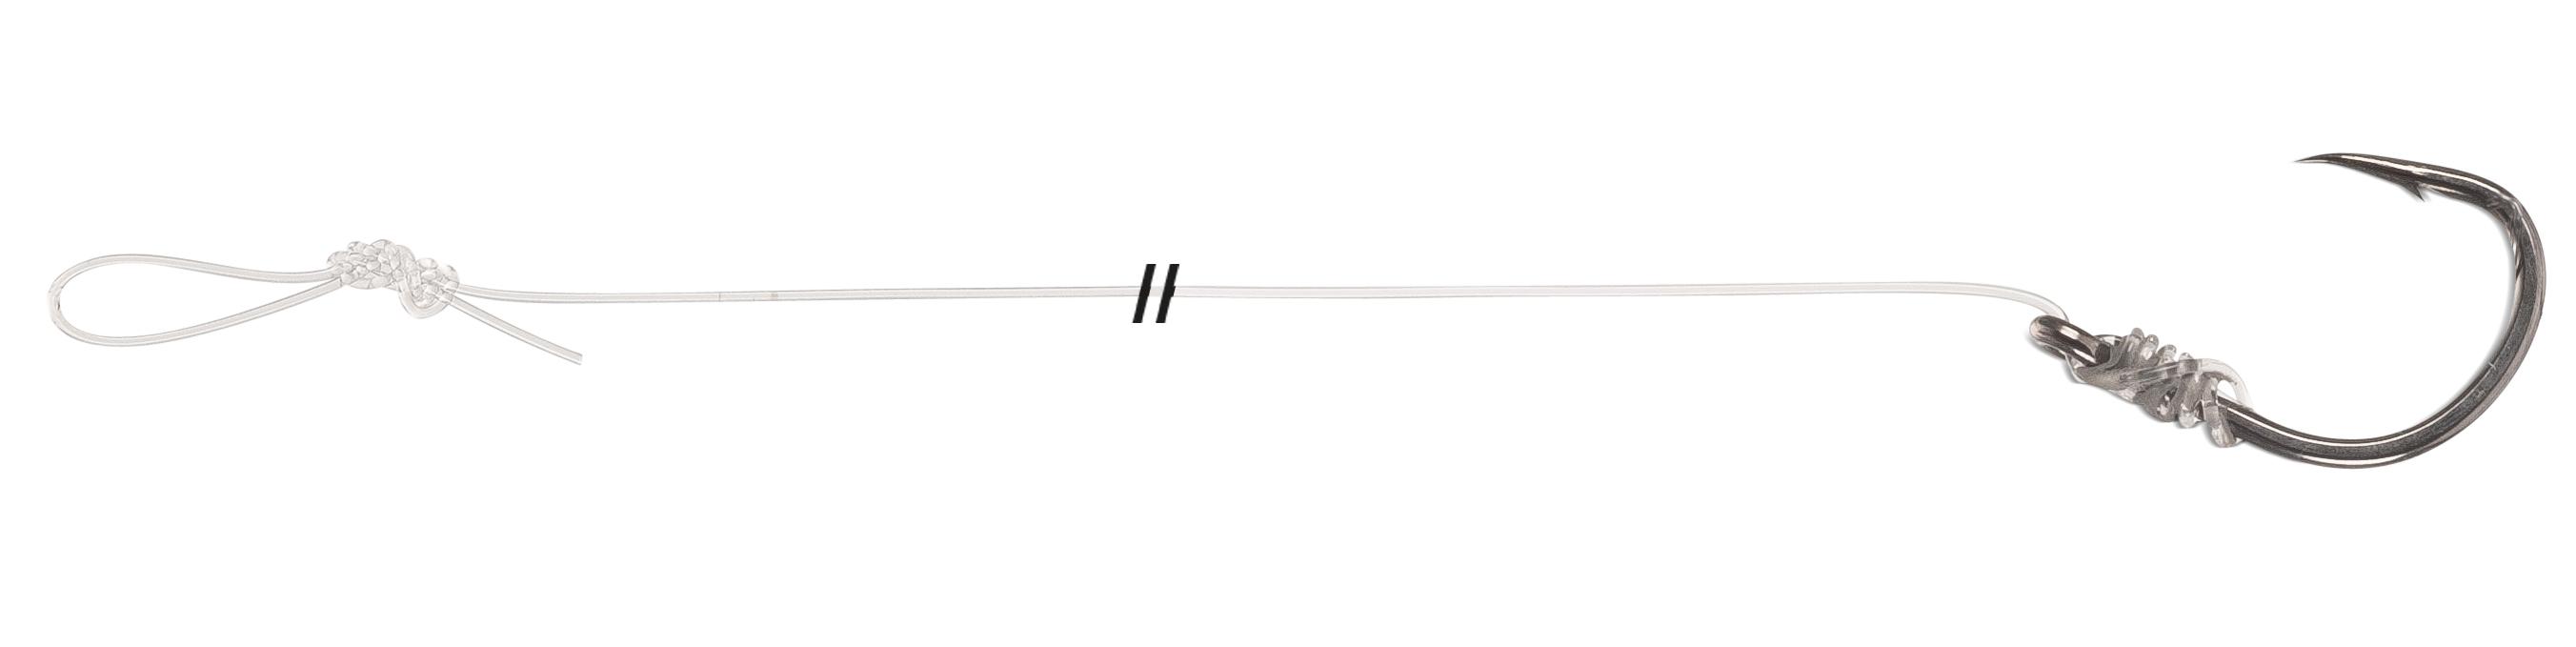 Uni Cat návazec S-Hook Mono Rig Velikost 6/0